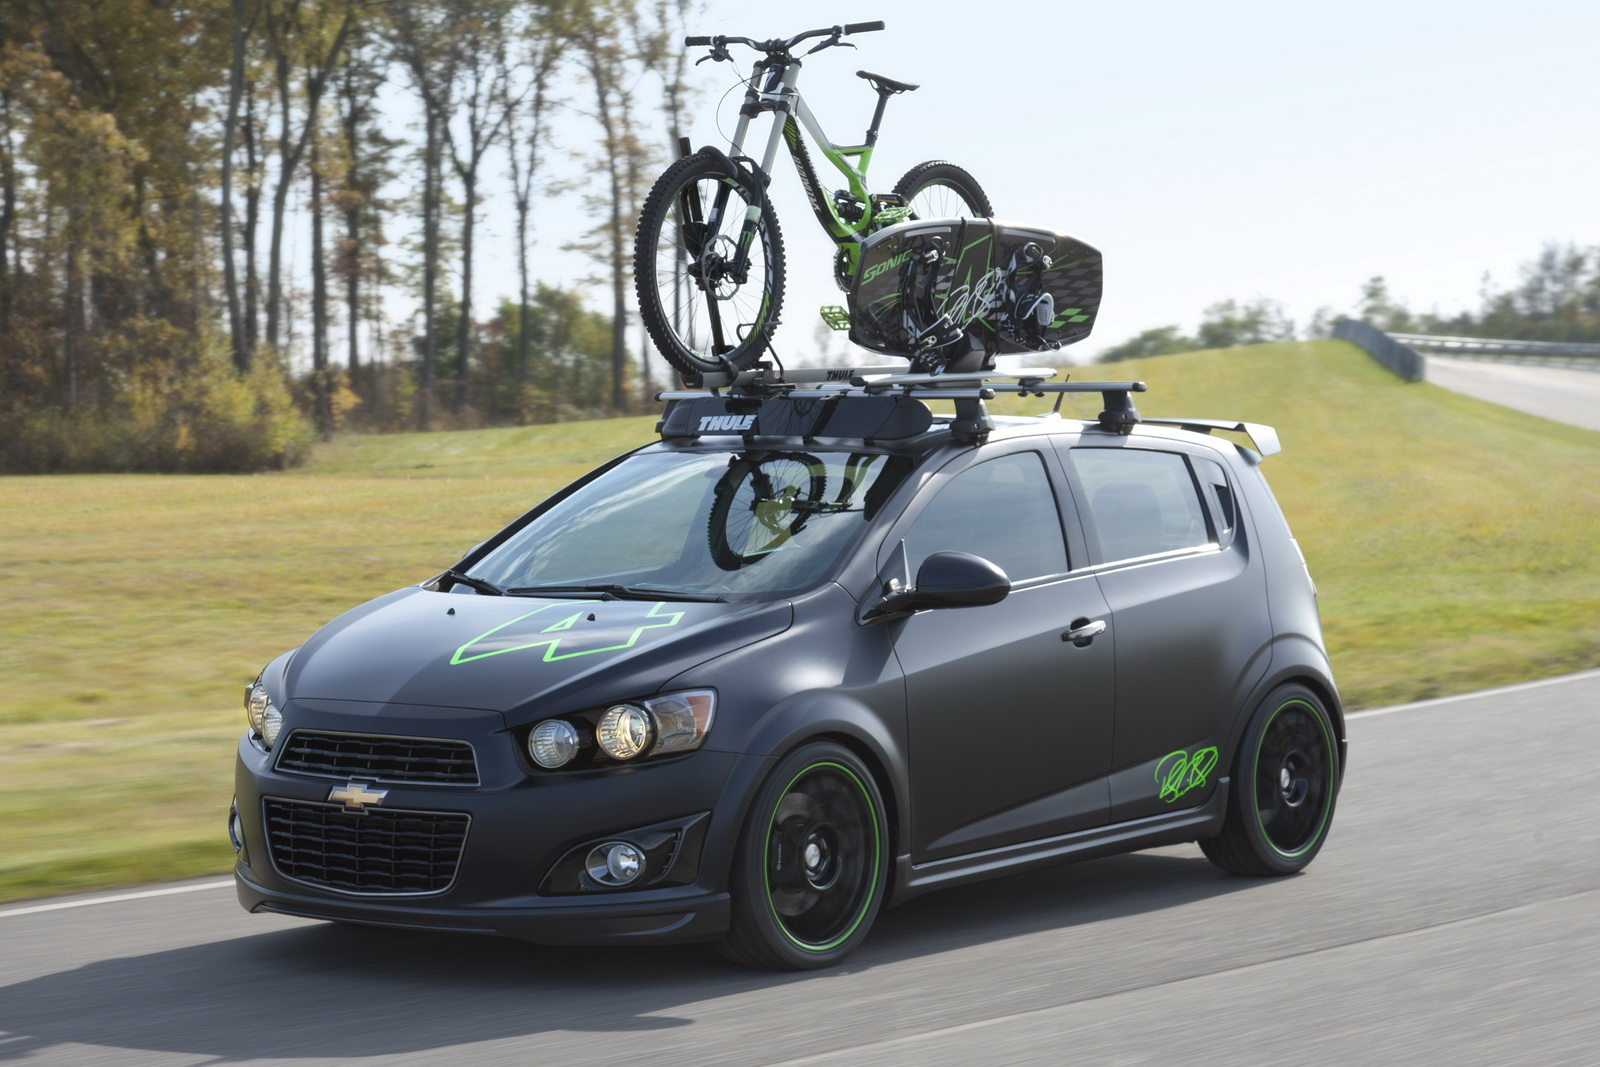 Chevrolet Sonic All Activity Vehicle